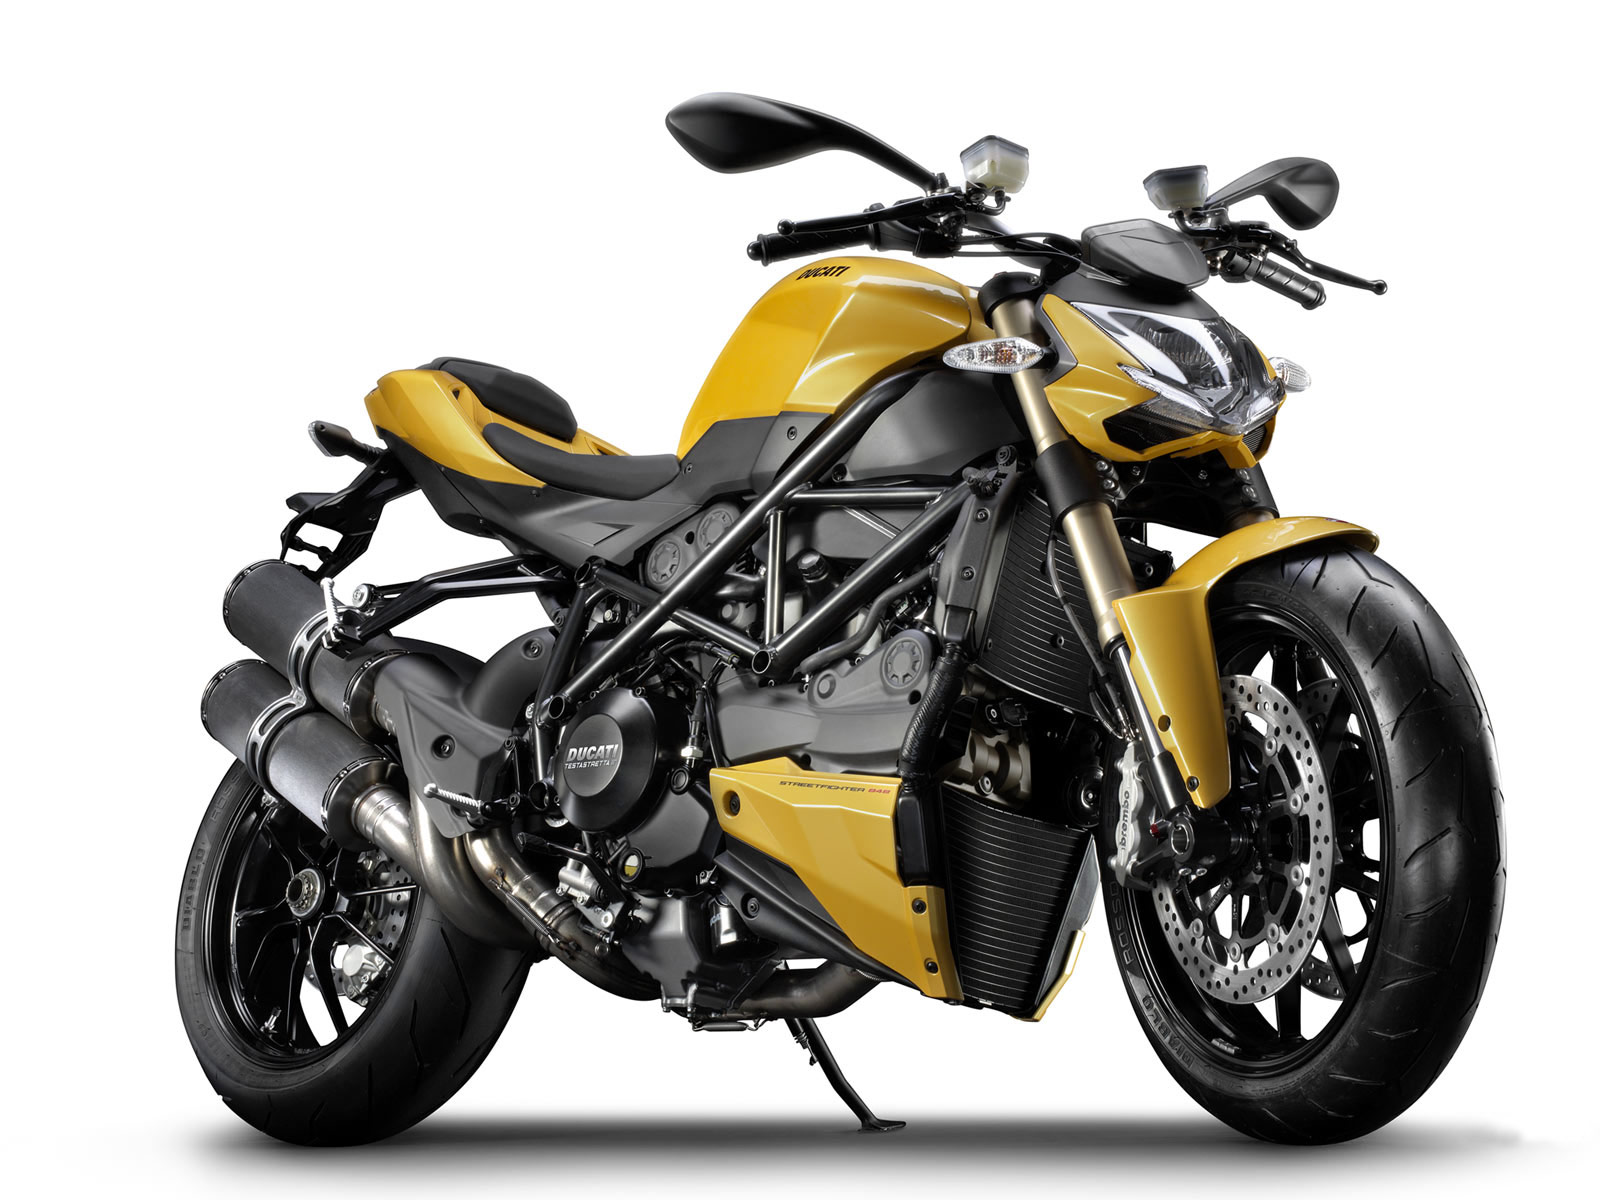 2012 ducati streetfighter 848 motorcycle wallpaper. Black Bedroom Furniture Sets. Home Design Ideas